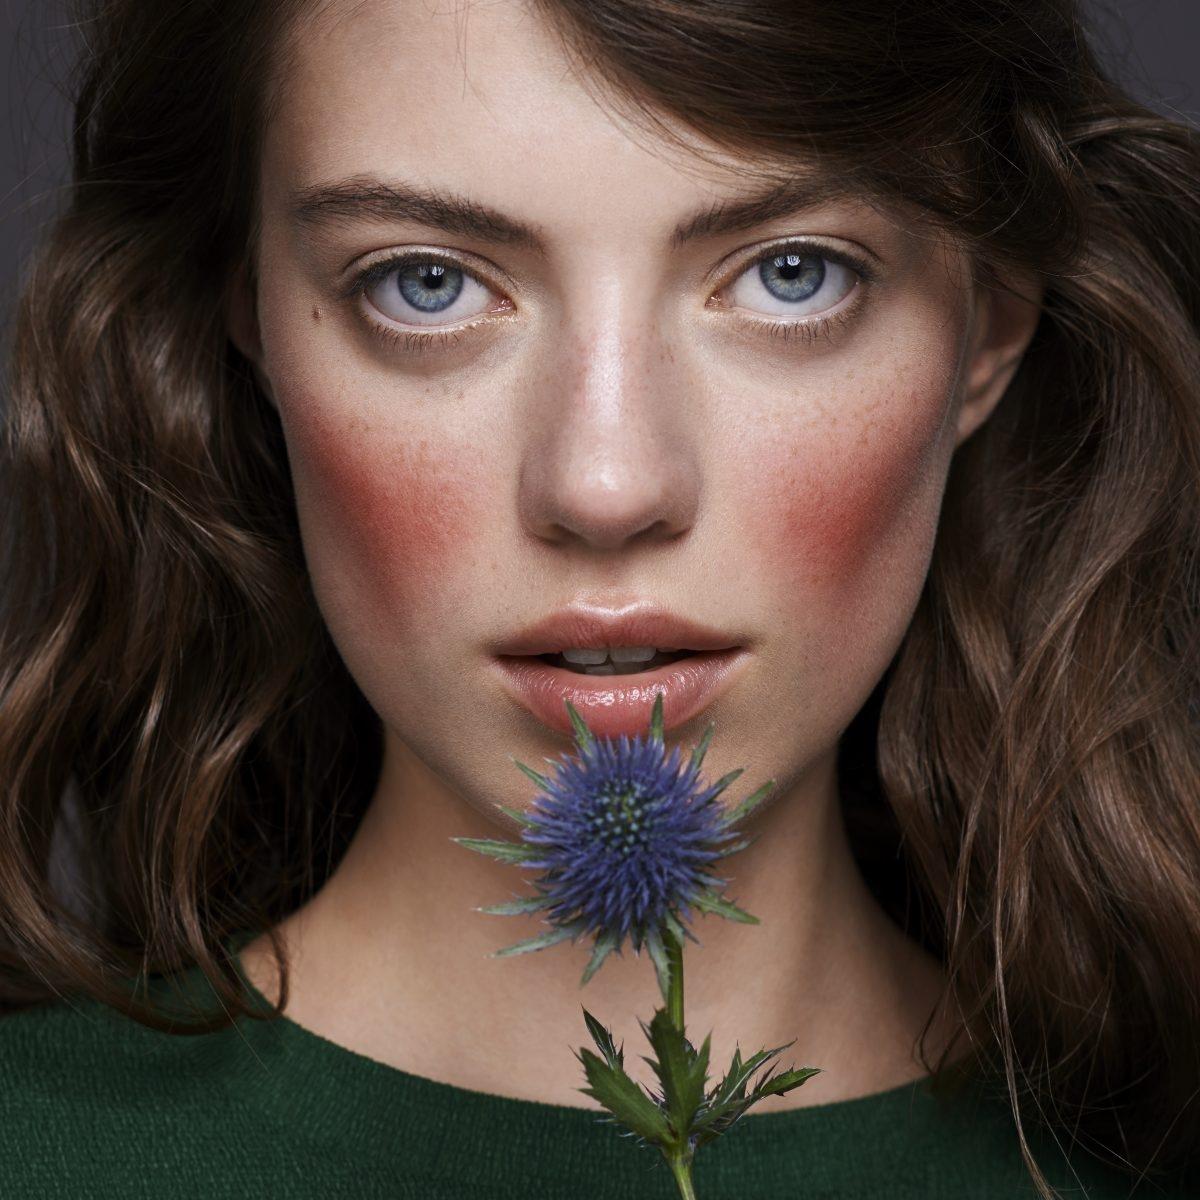 Photo courtesy The Beauty Archive